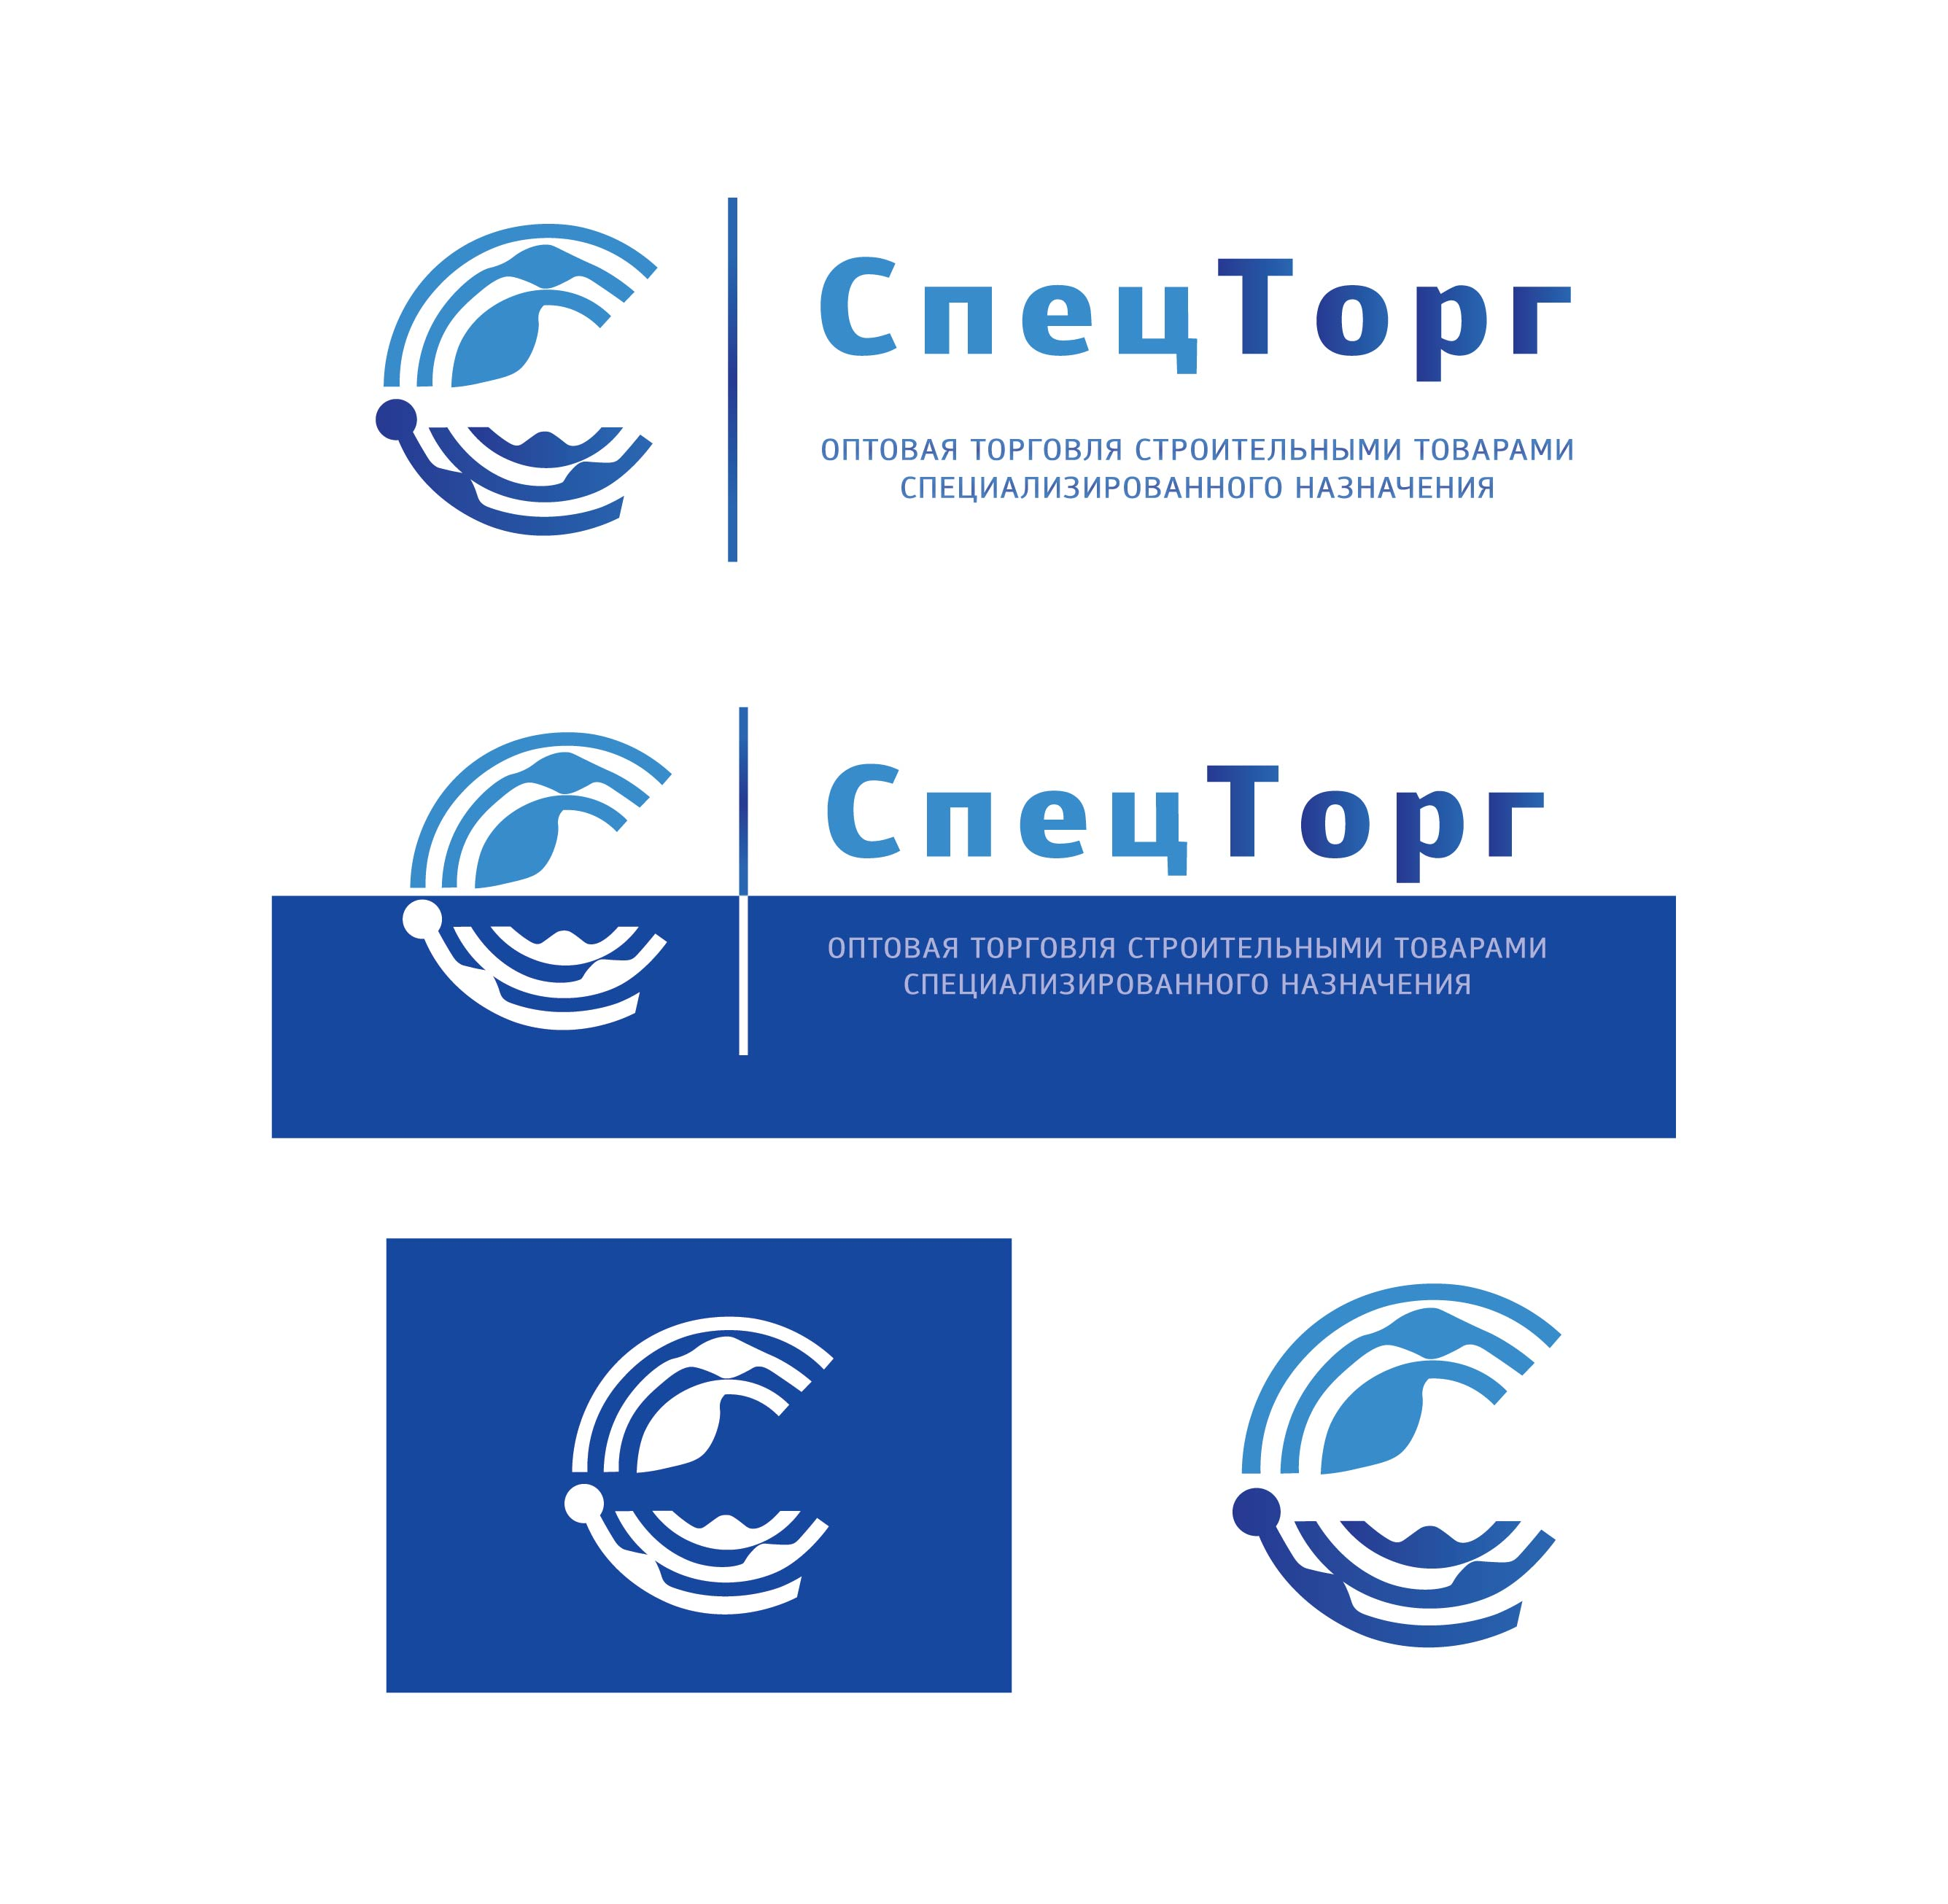 Разработать дизайн  логотипа компании фото f_8265dc2a01522182.jpg